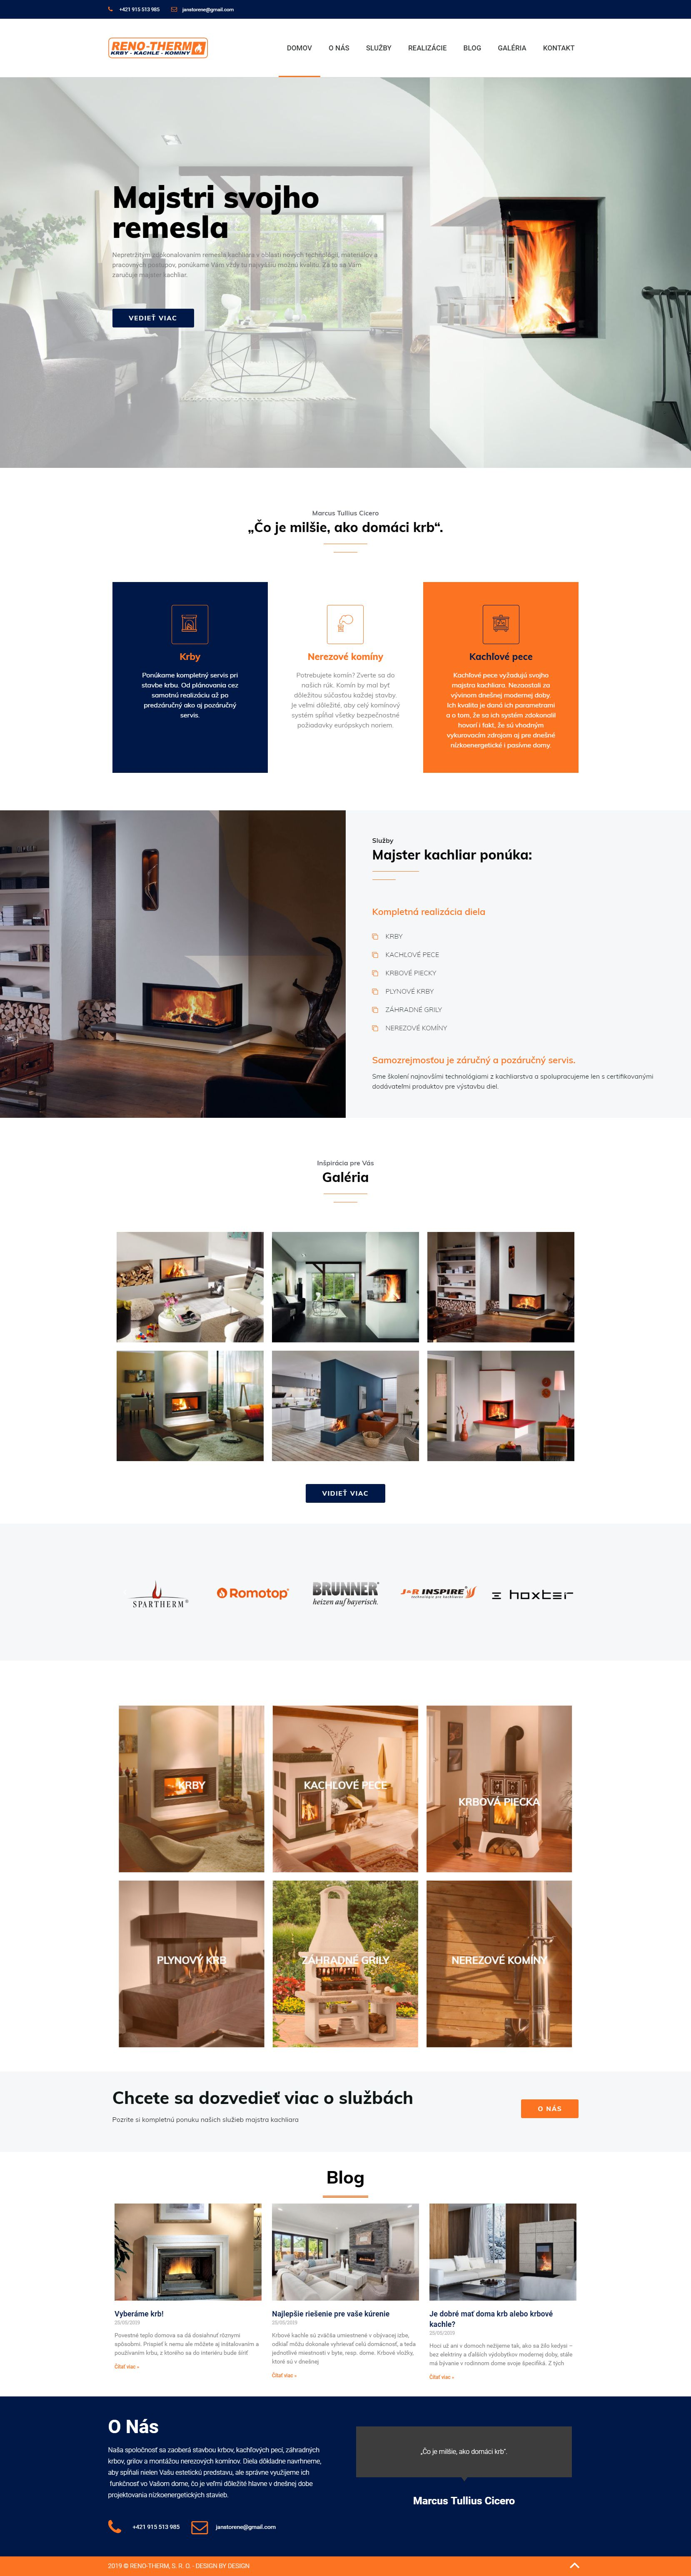 web design renothermkrby